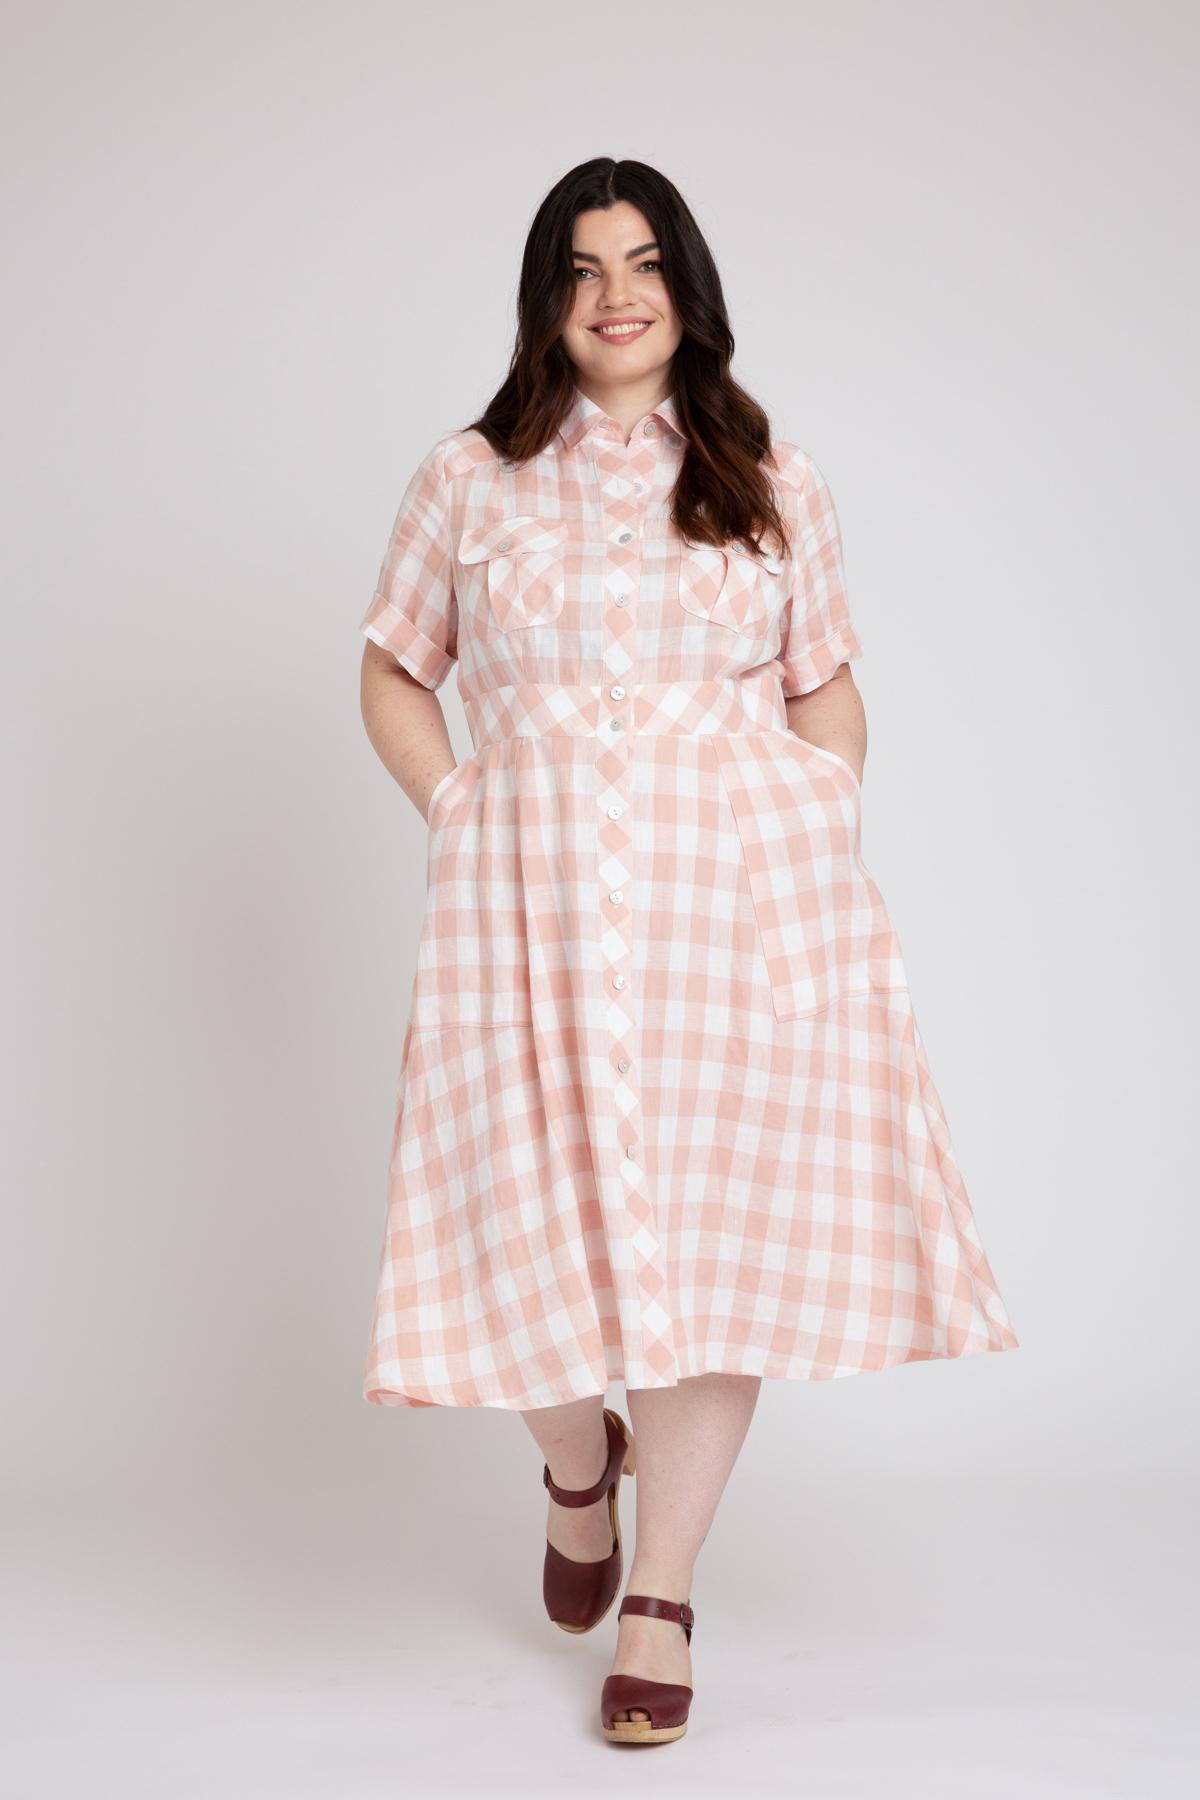 Megan Nielsen Matilda Curve Dress View B | Sizes 14-34